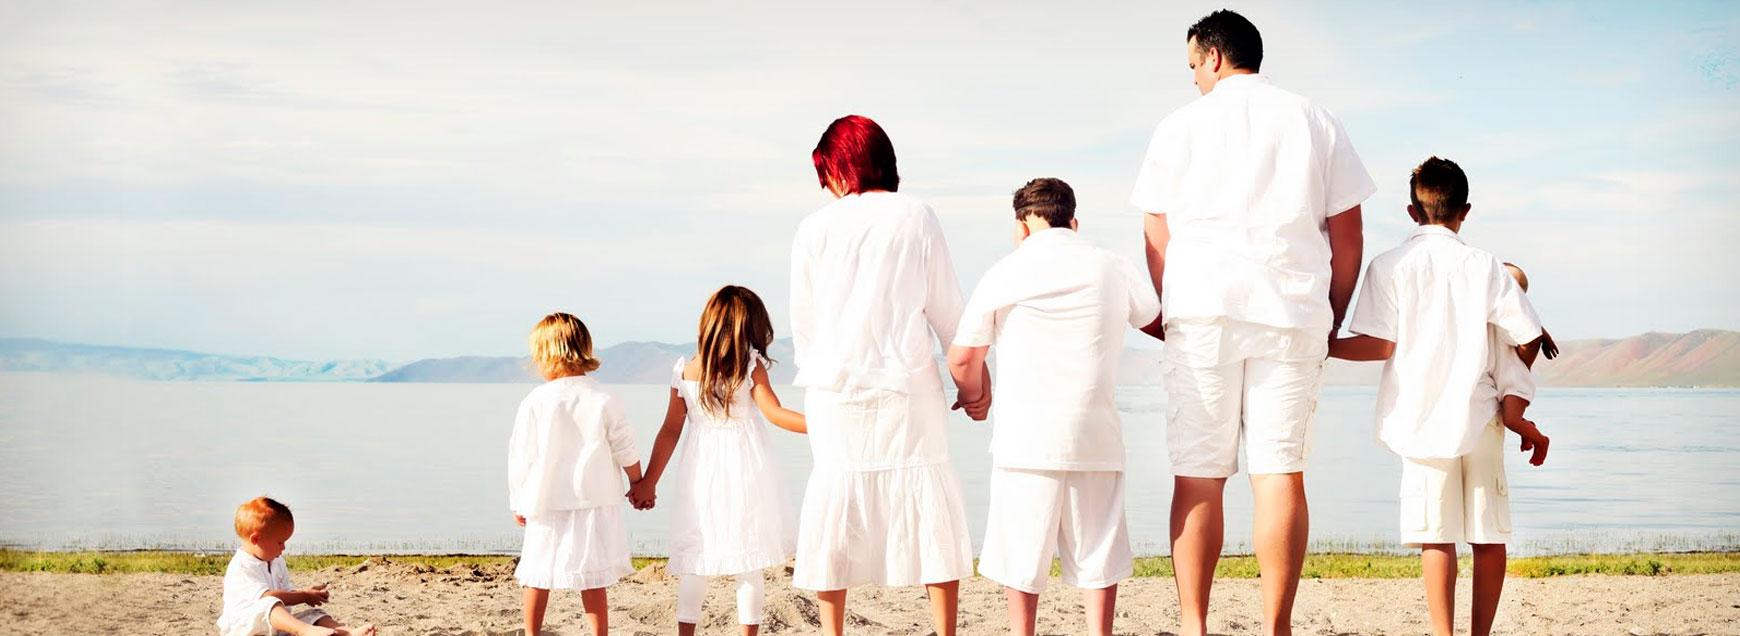 families-slide